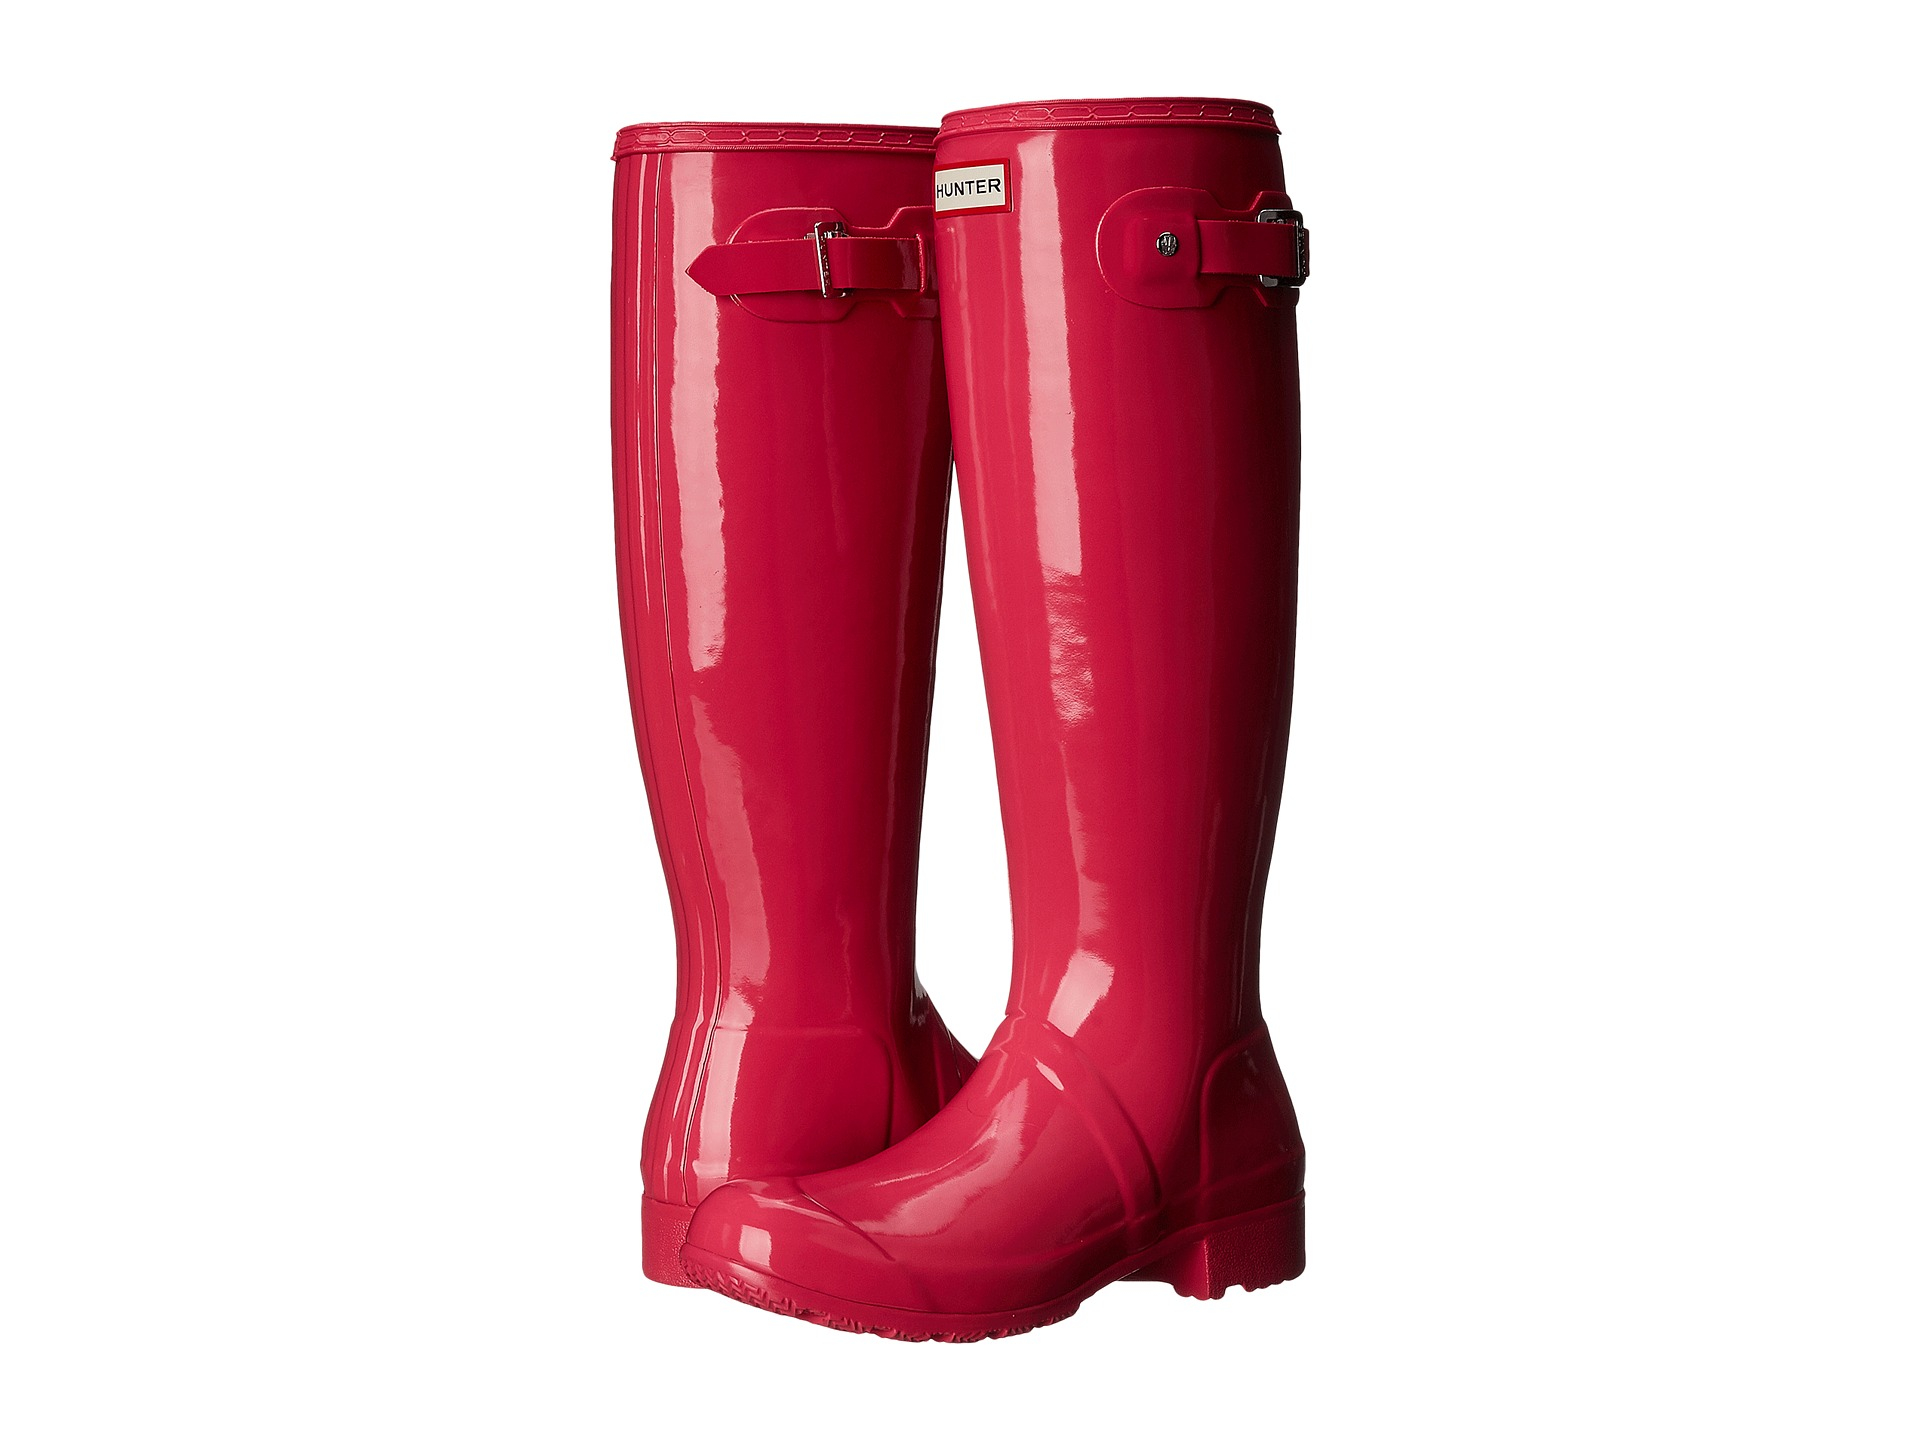 Womens Boots Hunter Original Tour Gloss Bright Cerise